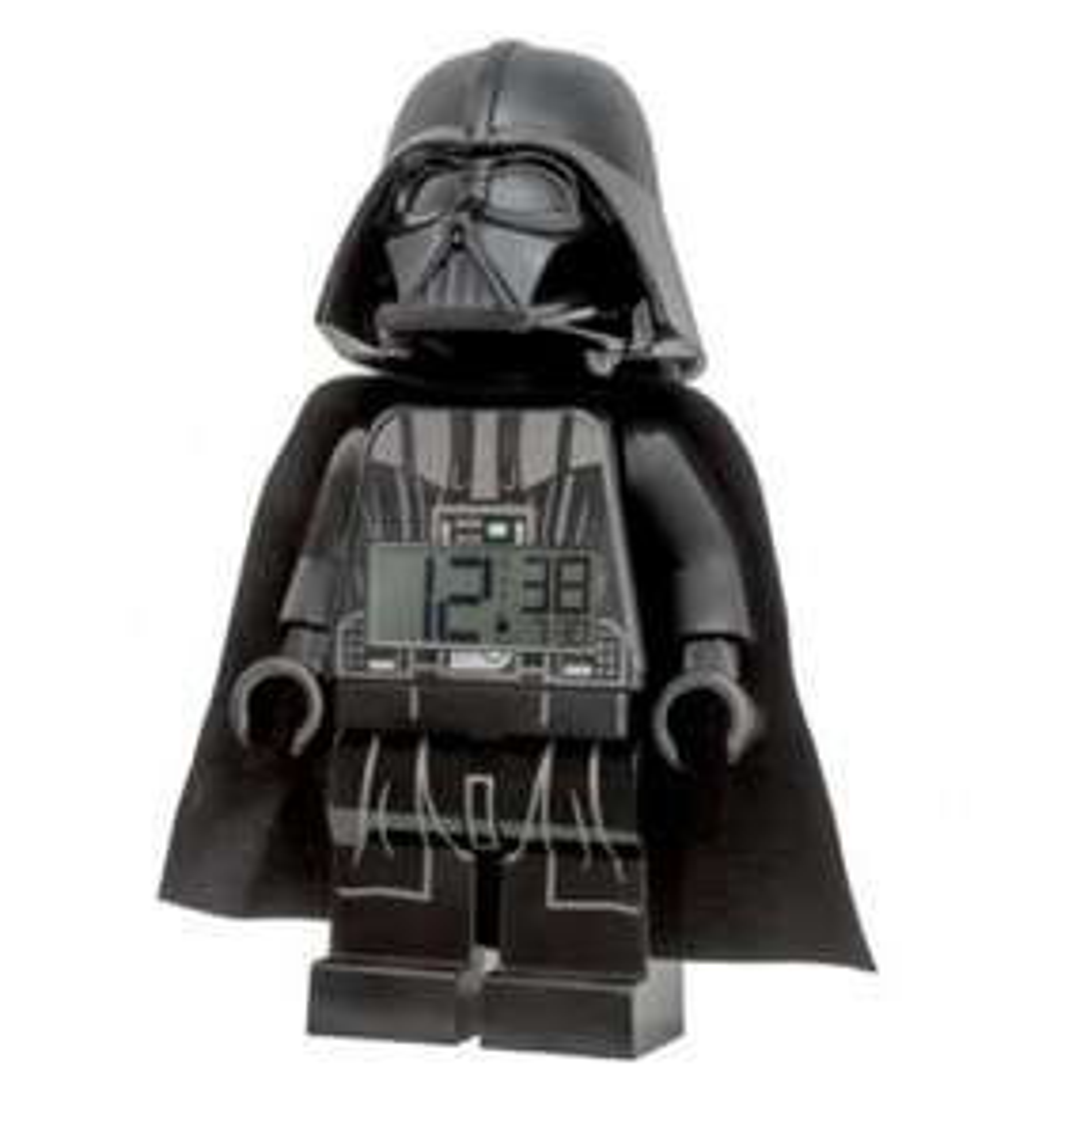 Luke I'm your alarmclock